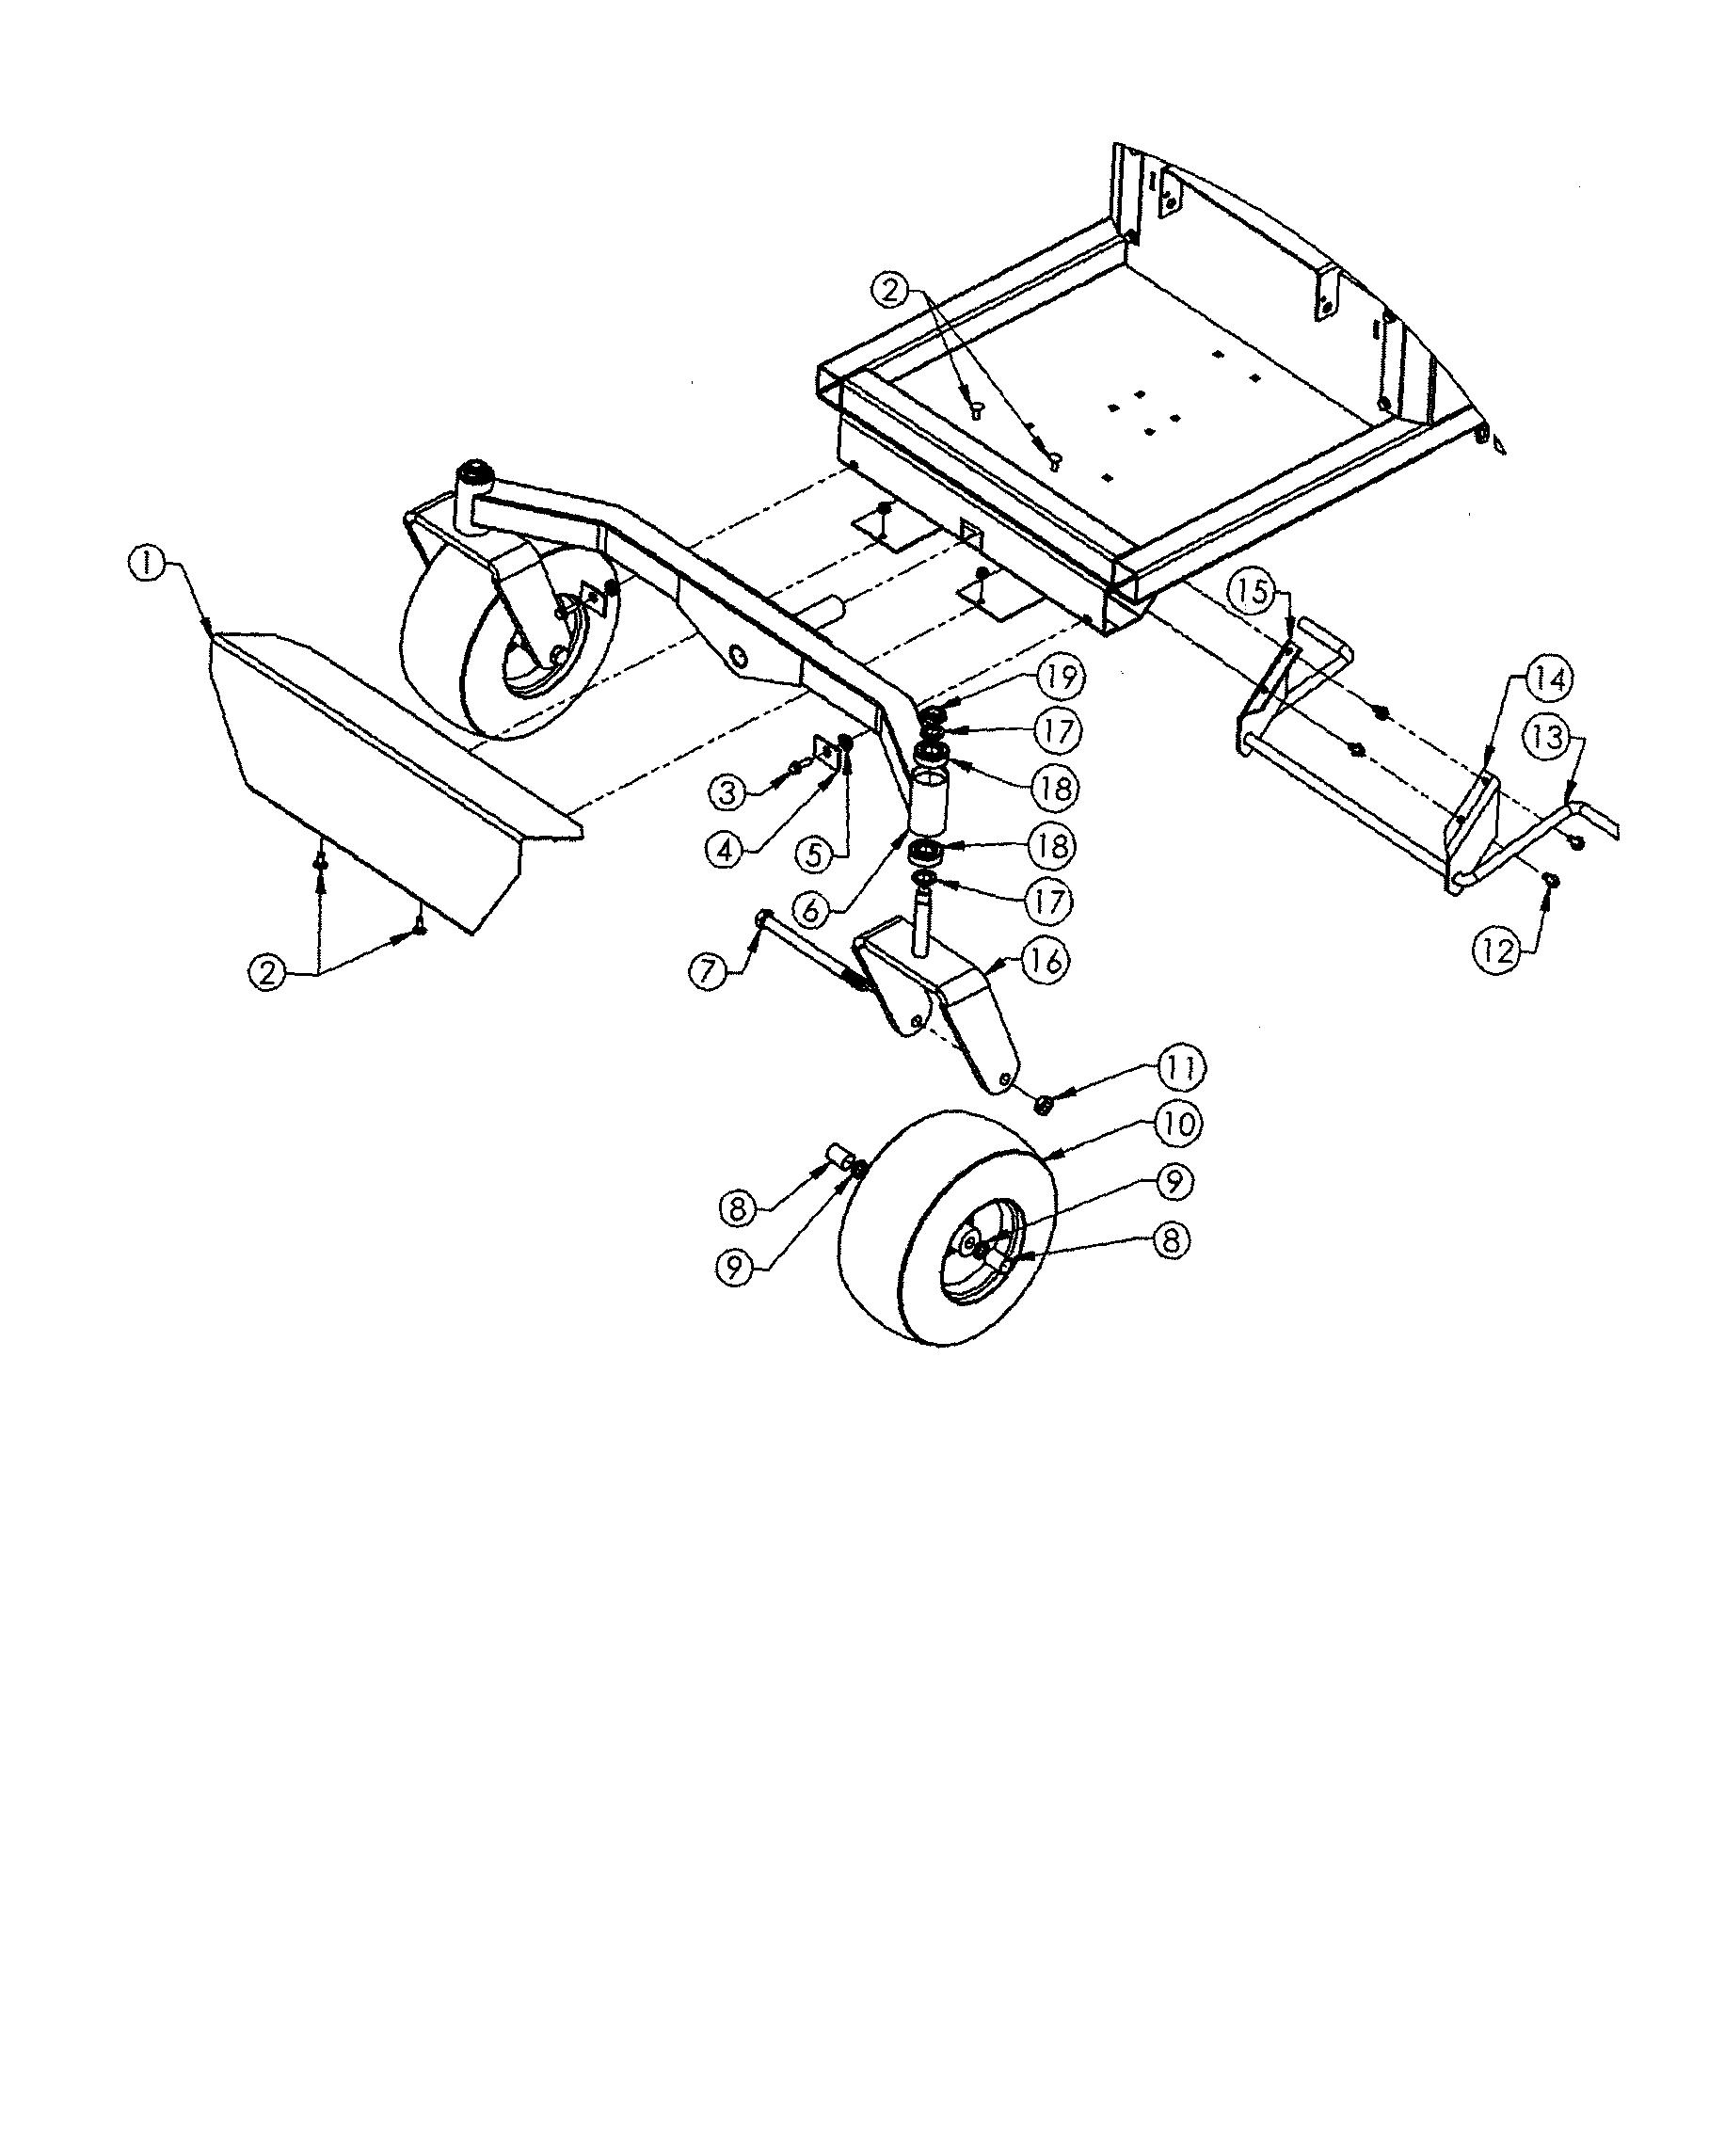 Swisher model ZT2766KZ lawn, riding mower rear engine